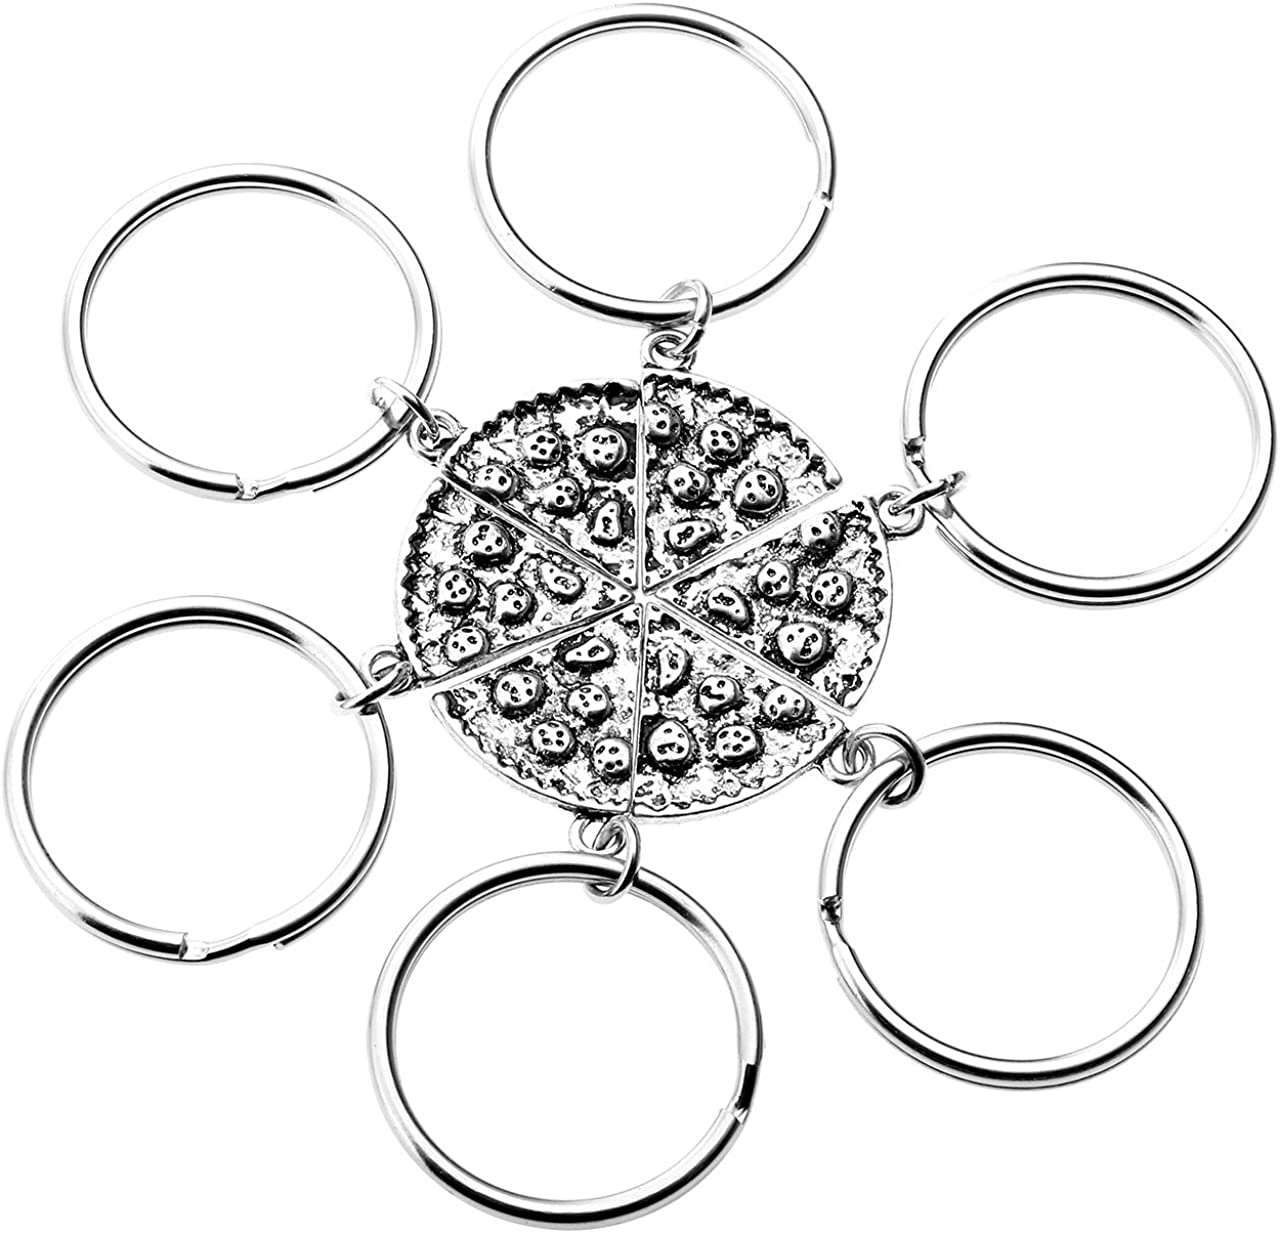 JOVIVI 6pcs Antique Silver Color Metal Pizza Slice Matching Pendant Keychain Best Friends Friendship Gifts